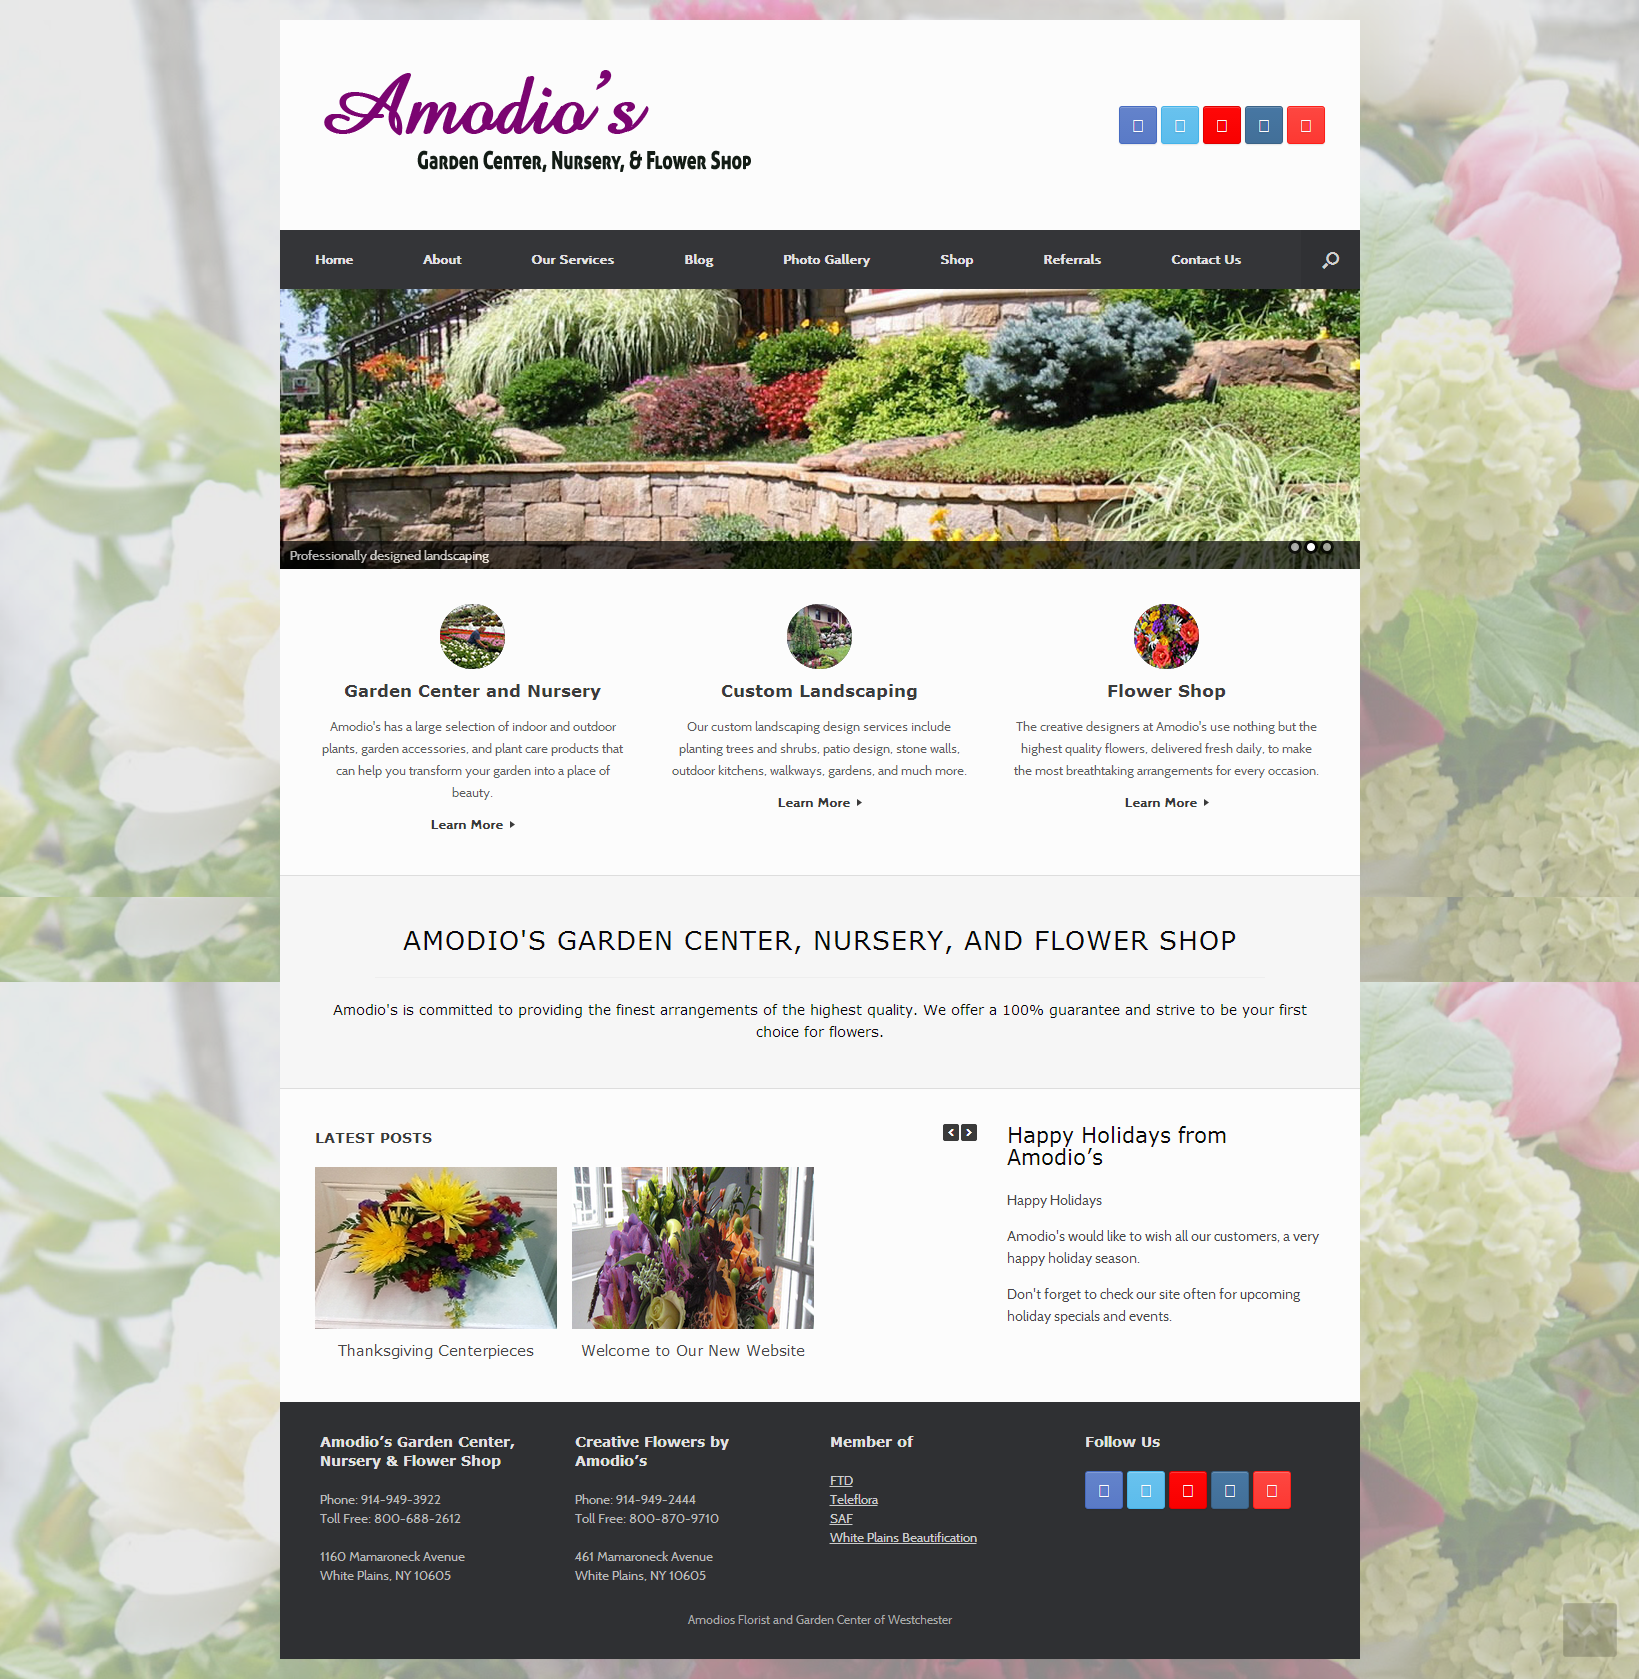 Amodiosgarden.com